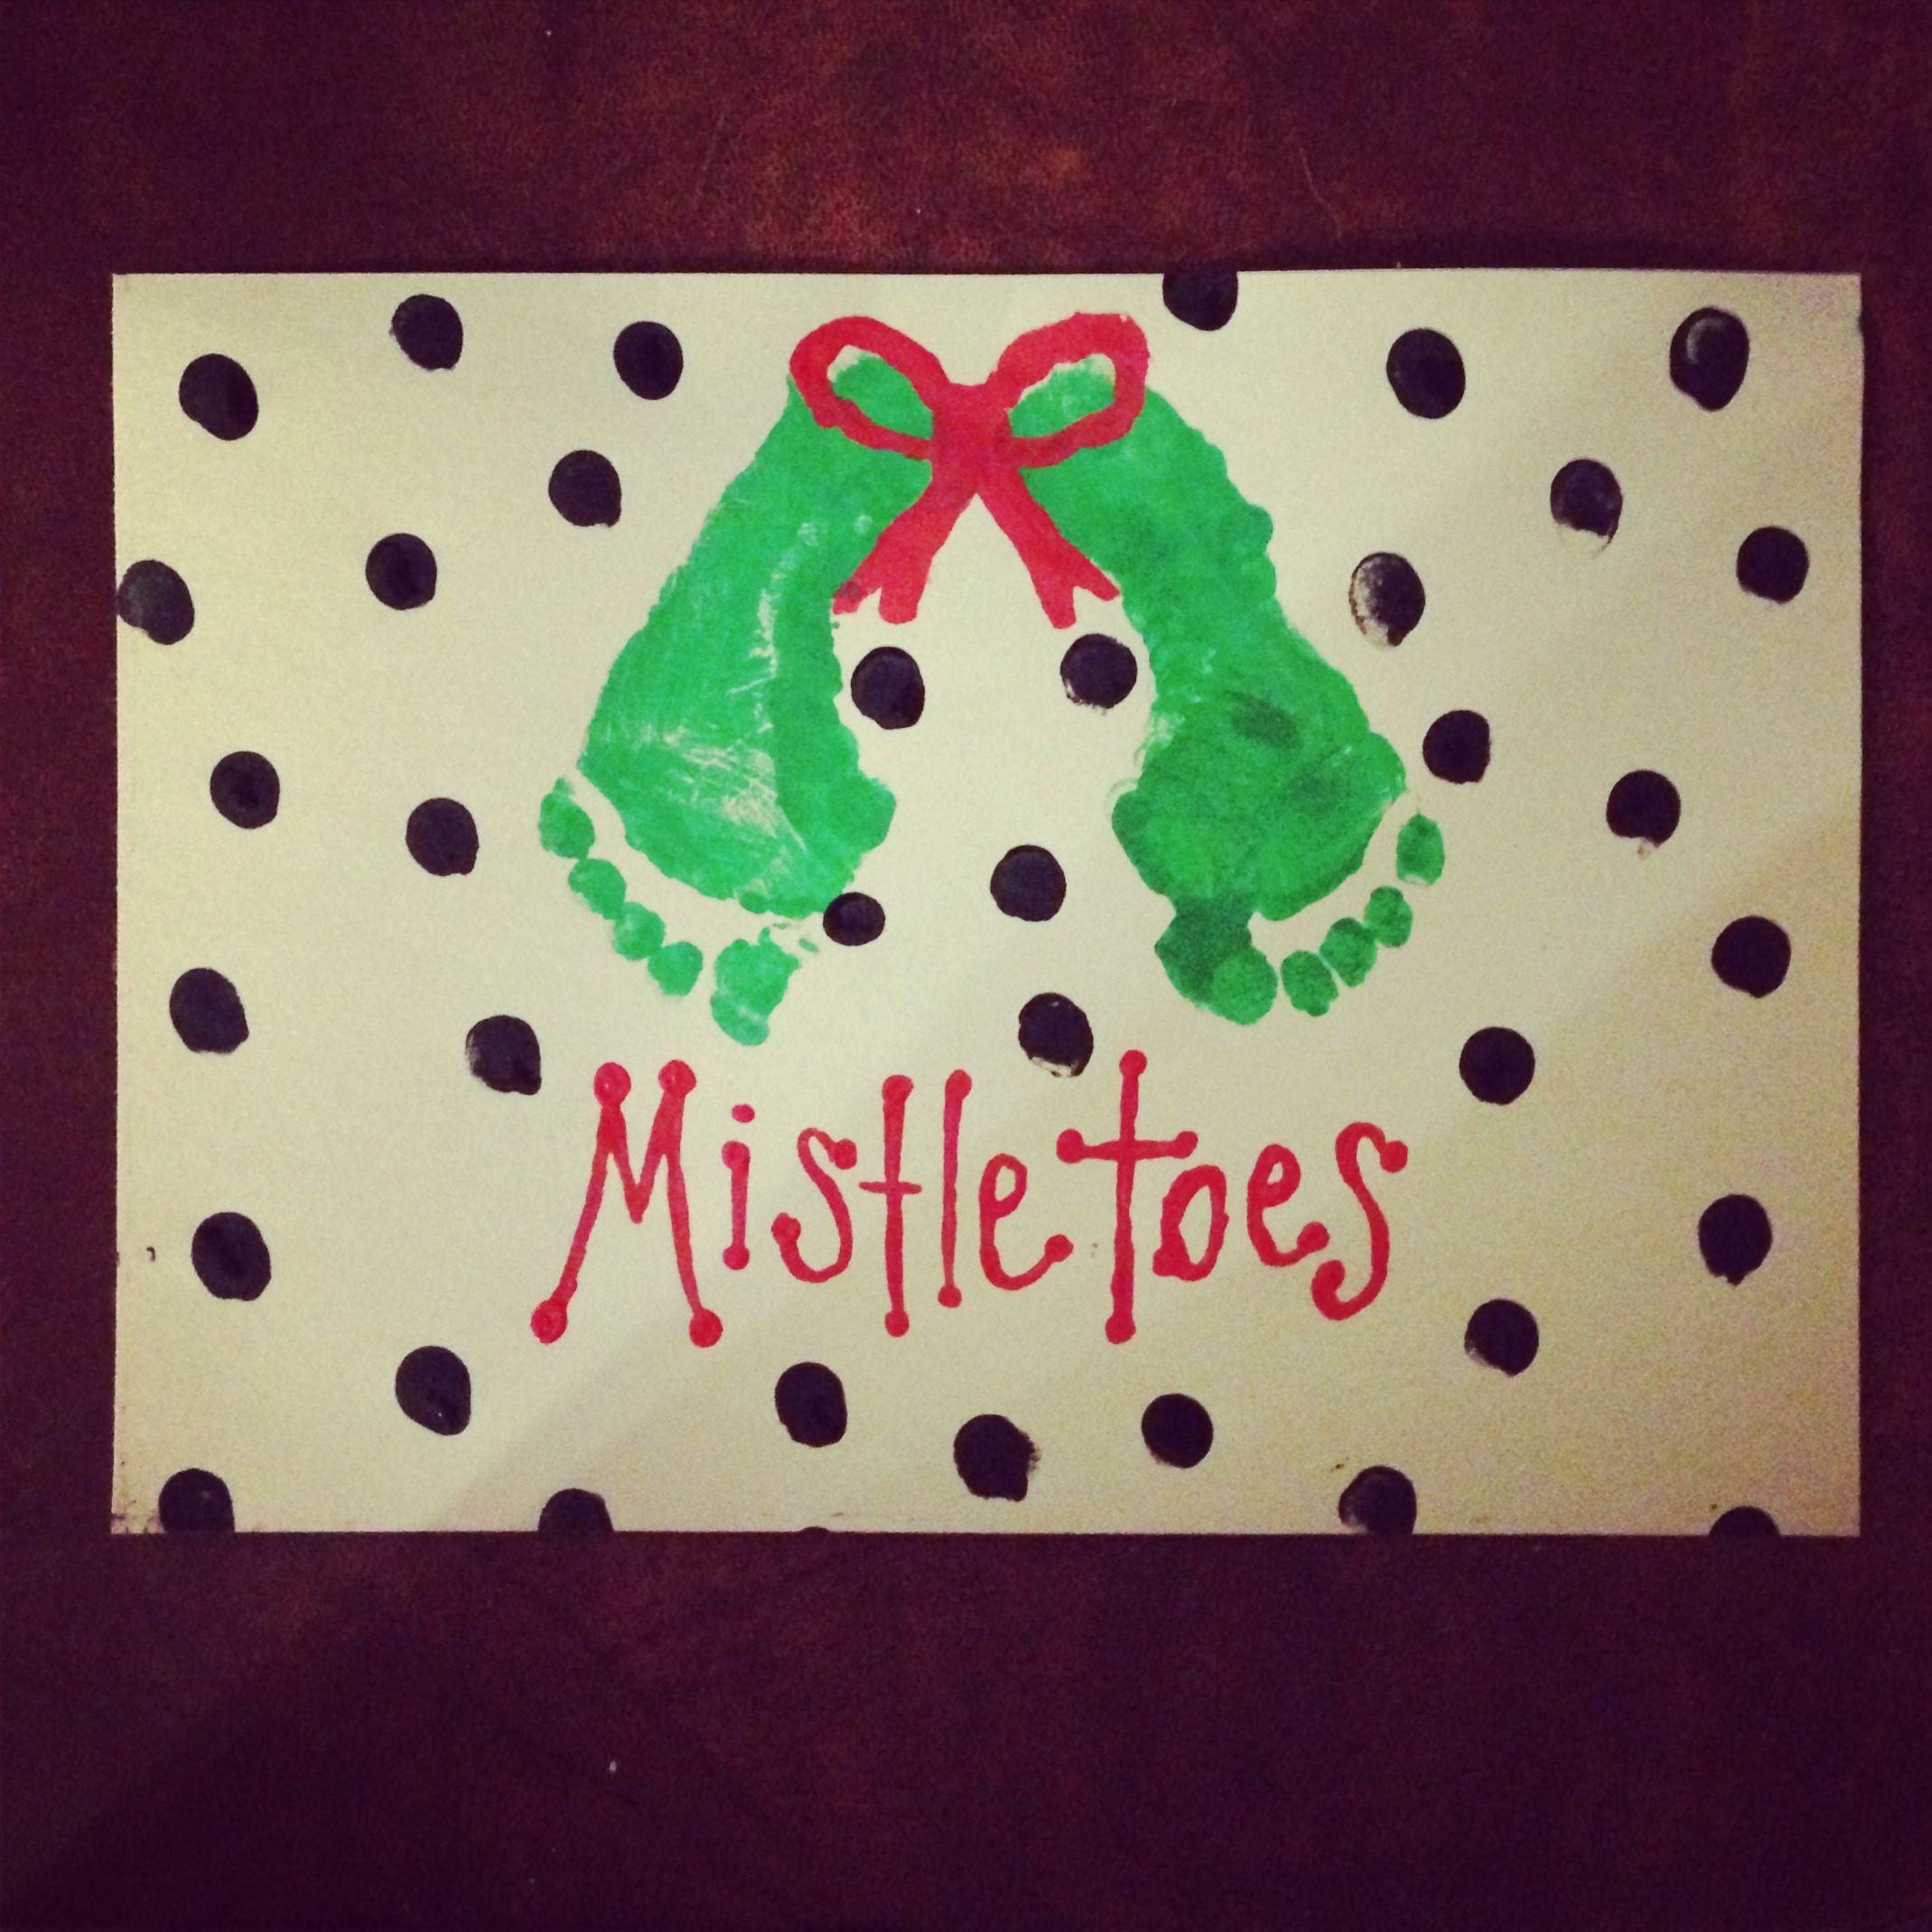 Mistletoes Christmas Crafts Painted Footprint